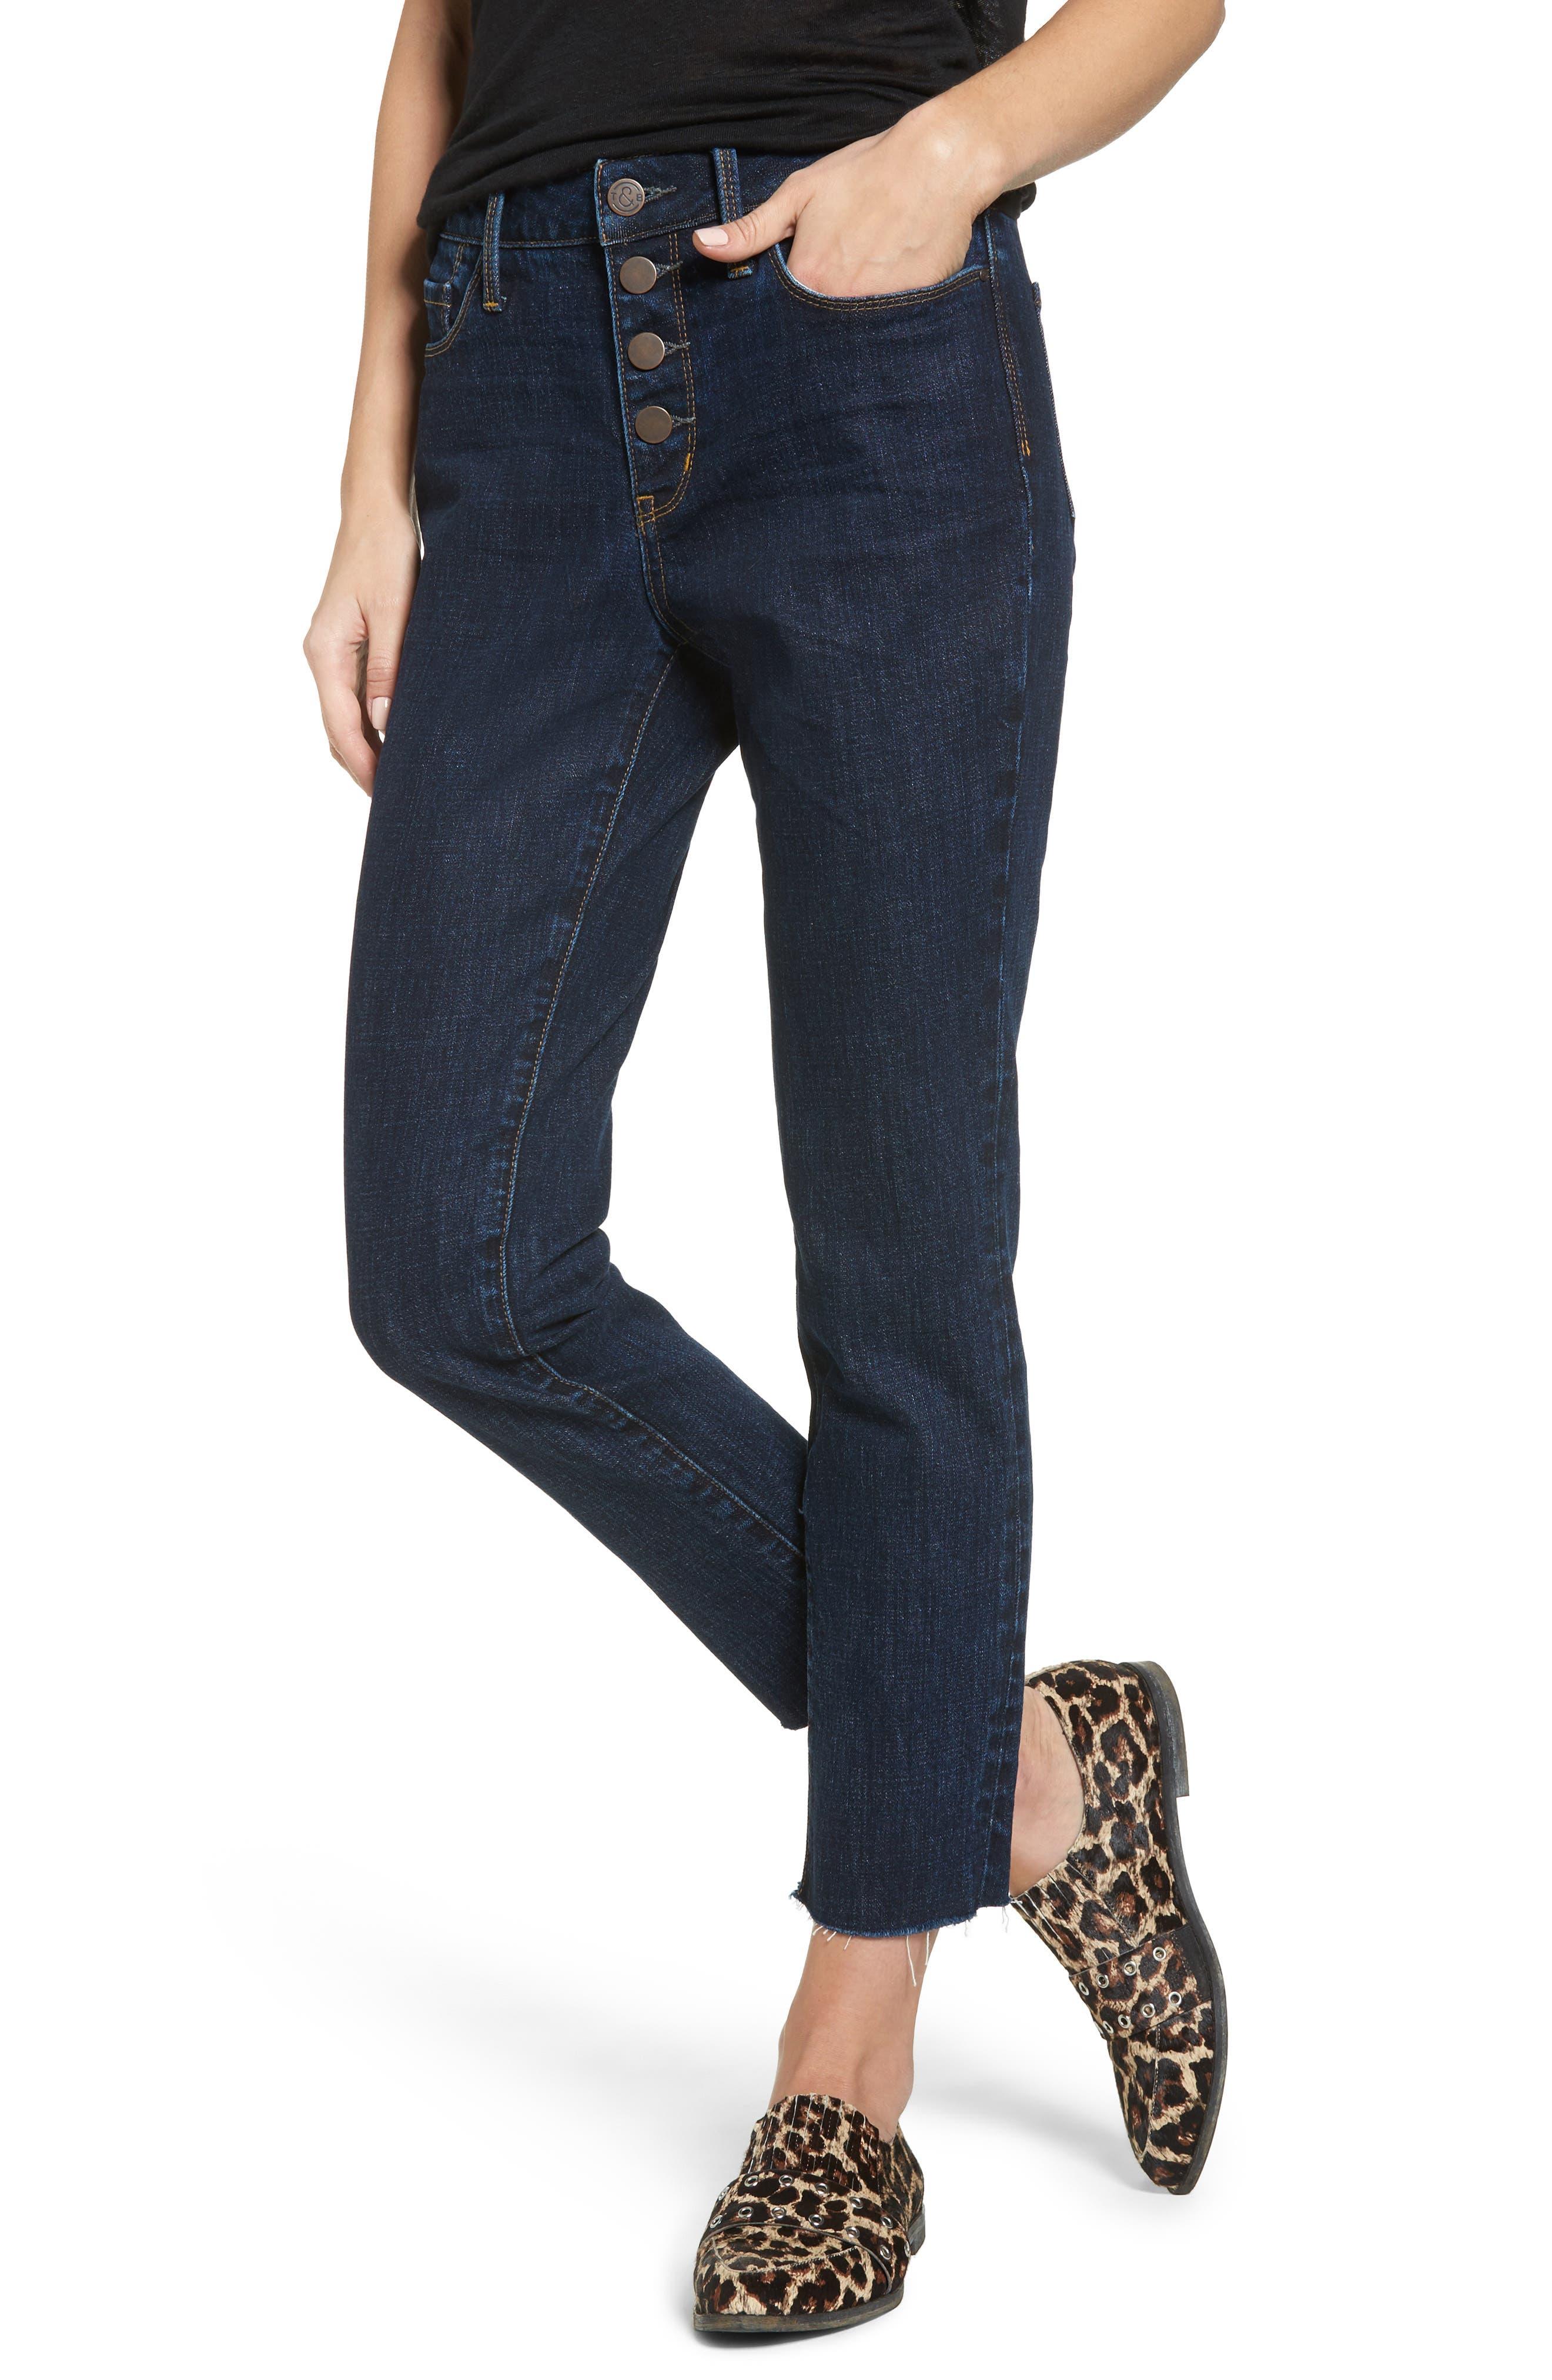 Bond Loose Fit Skinny Ankle Jeans,                         Main,                         color, Granite Dark Vintage